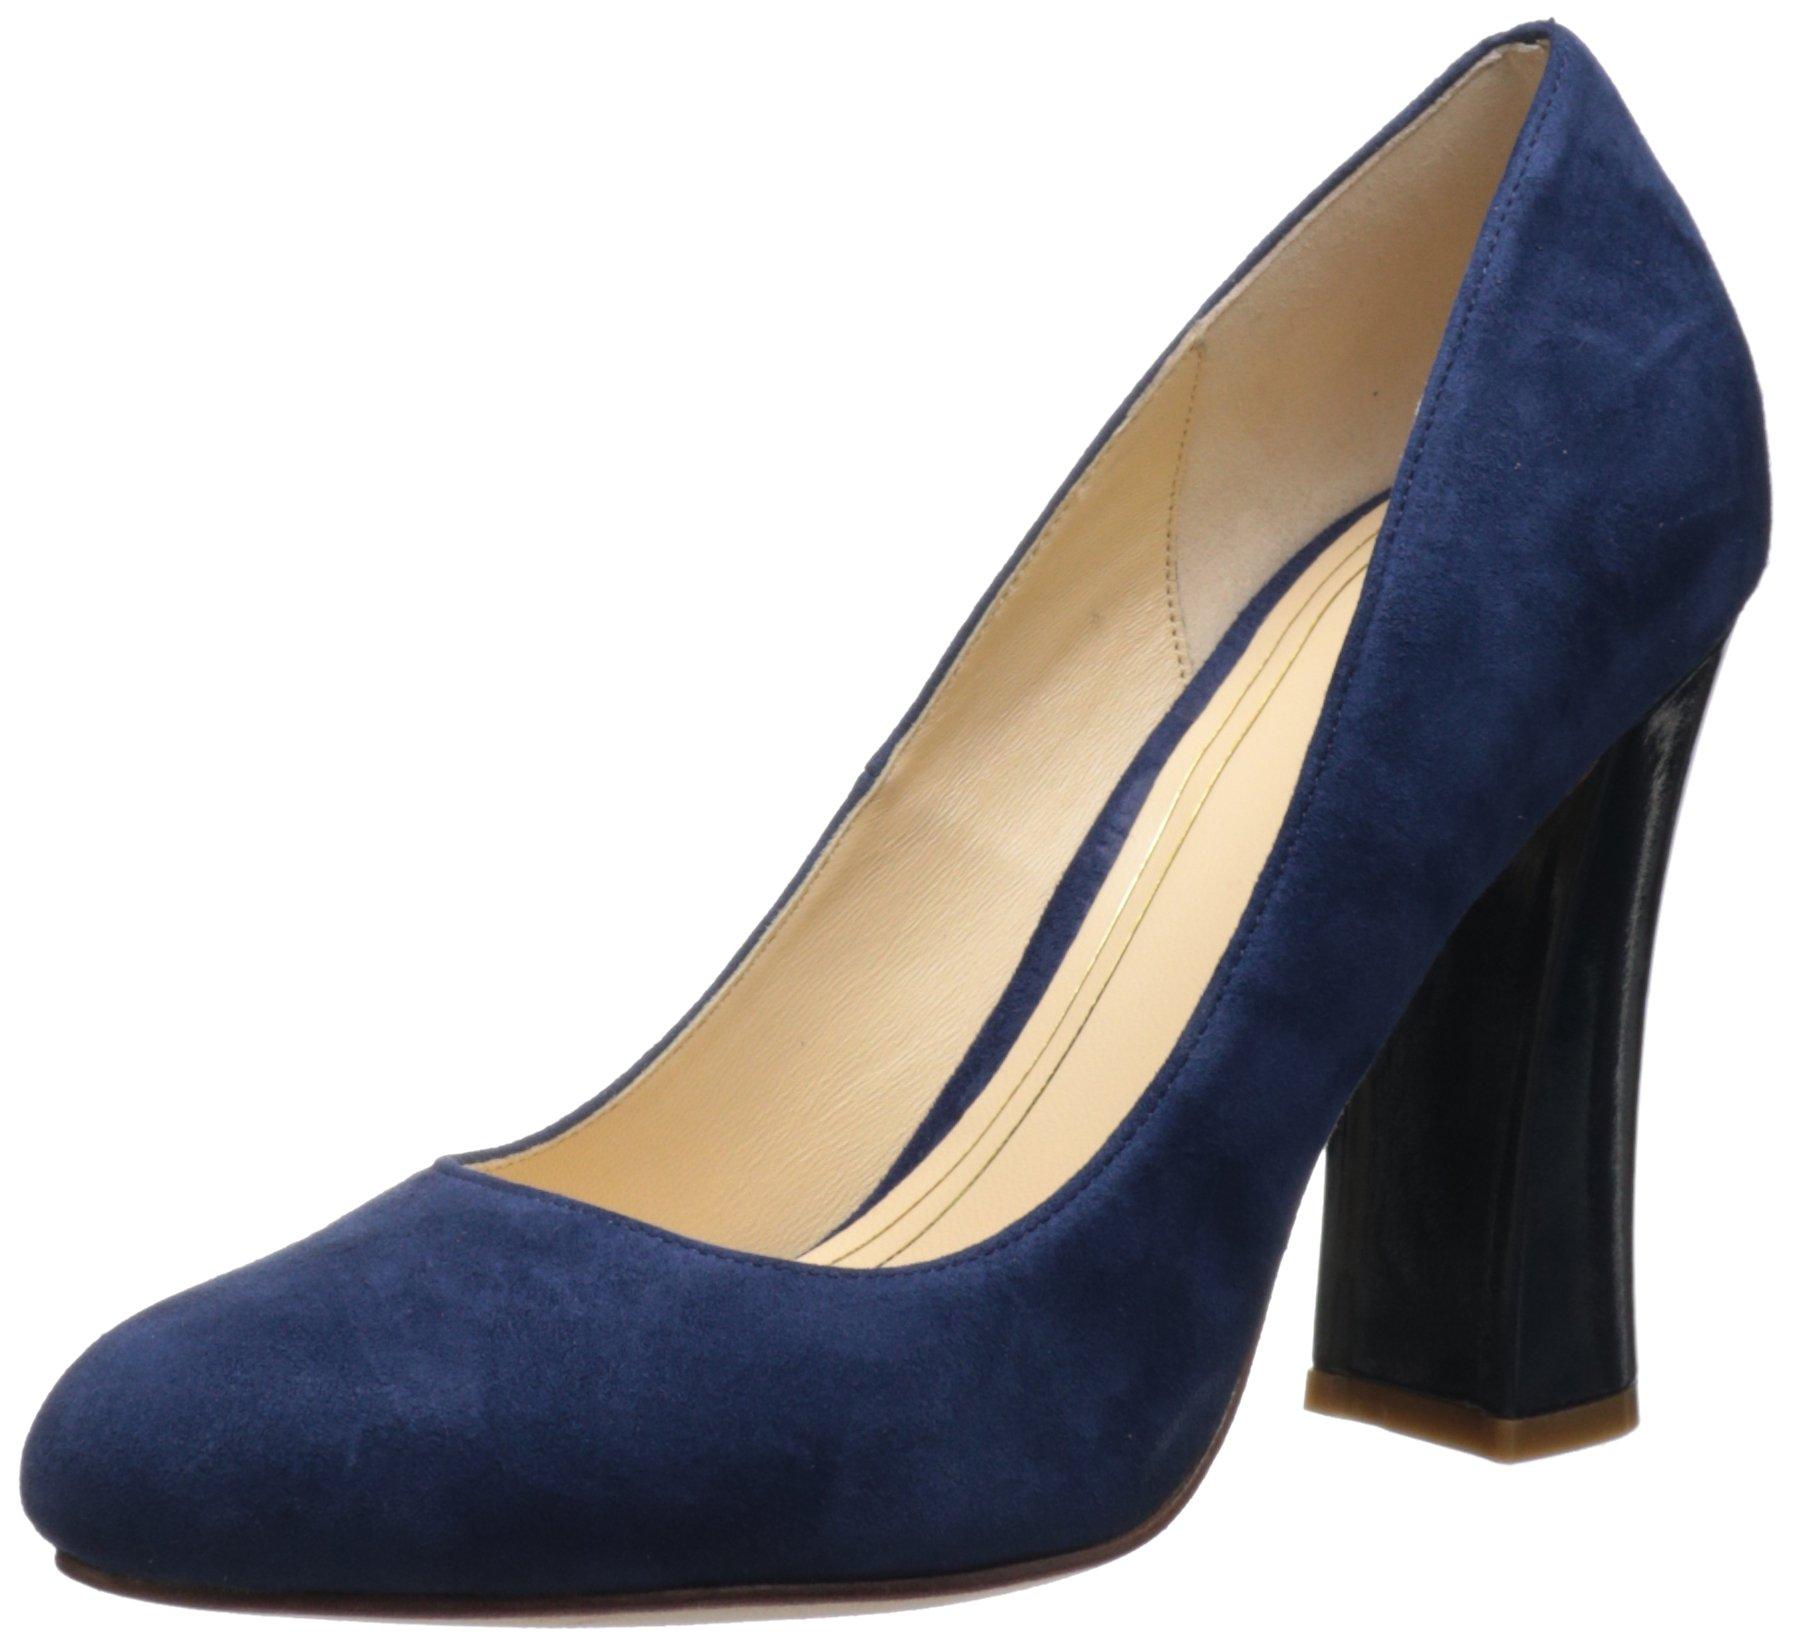 Cole Haan Women's Chelsea High Flared Heel Pump,Blazer Blue Suede Patent,8.5 B US